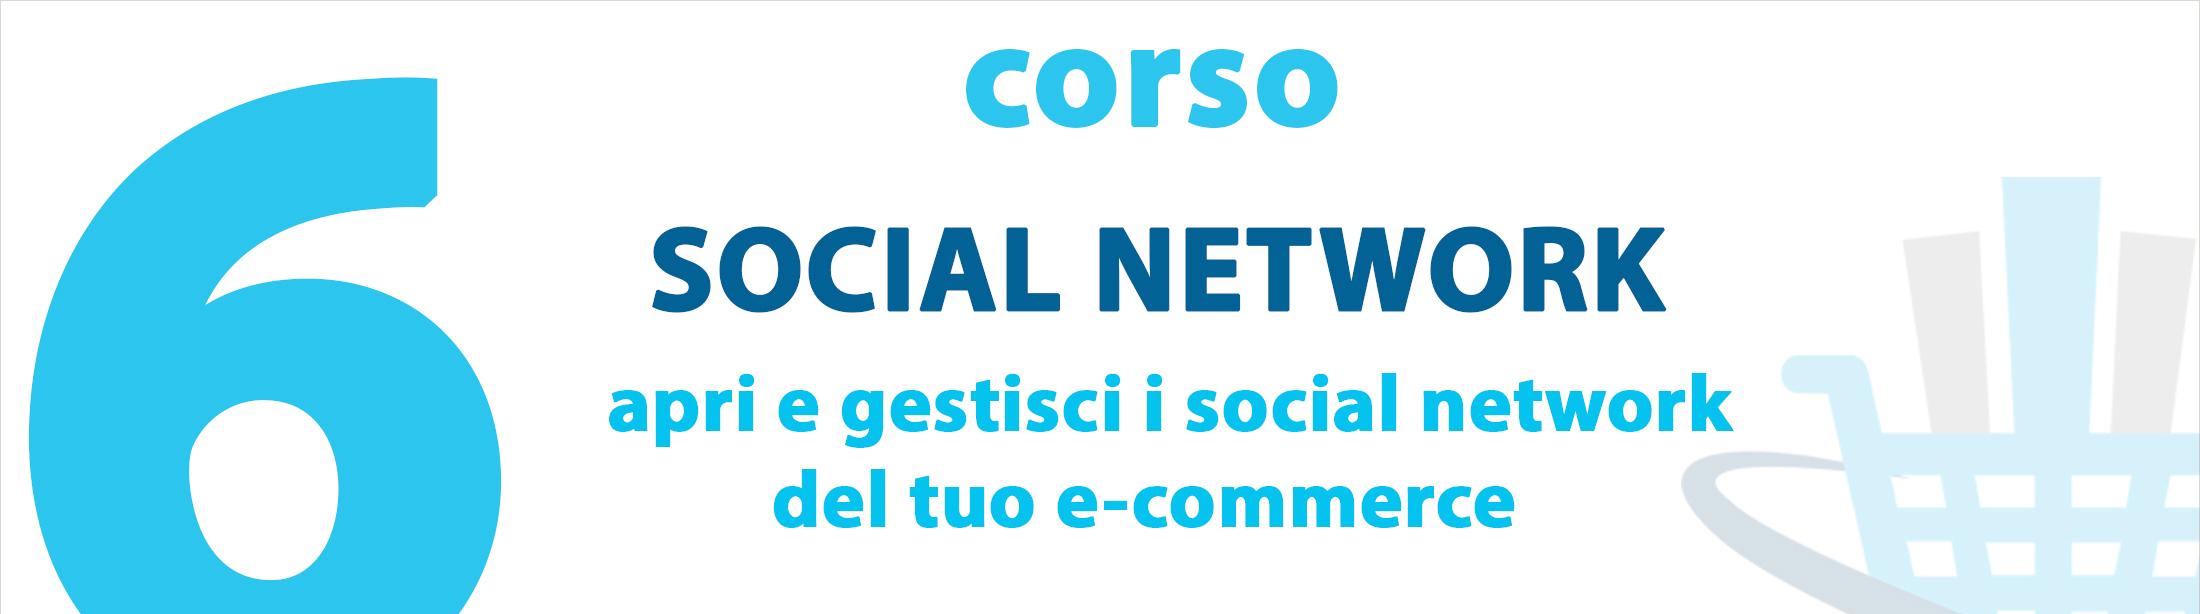 corsosmall6socialnetworkecommerce